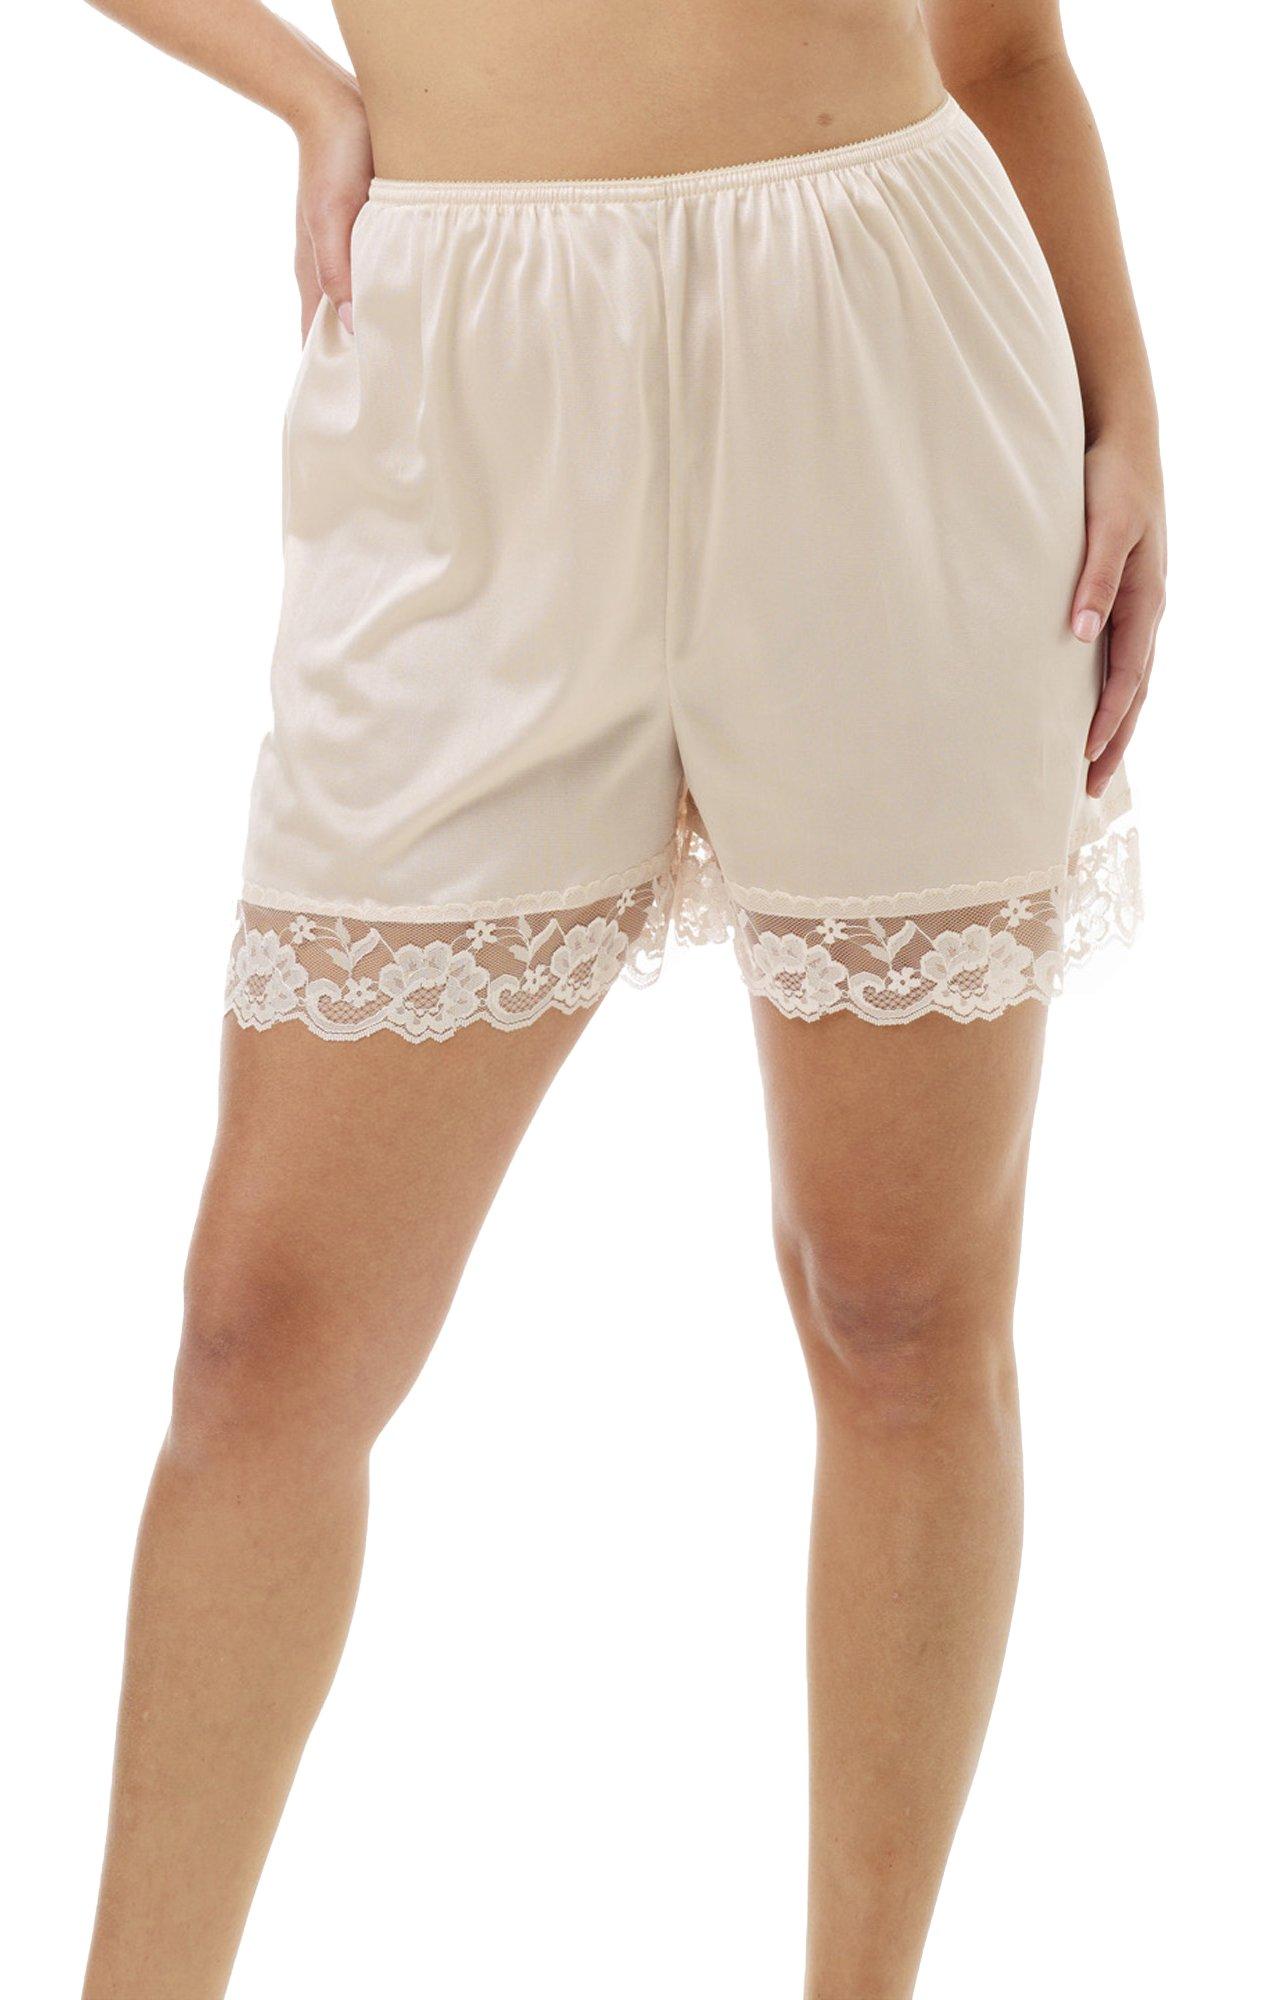 Underworks Pettipants Nylon Culotte Slip Bloomers Split Skirt 4-inch Inseam 3-Pack